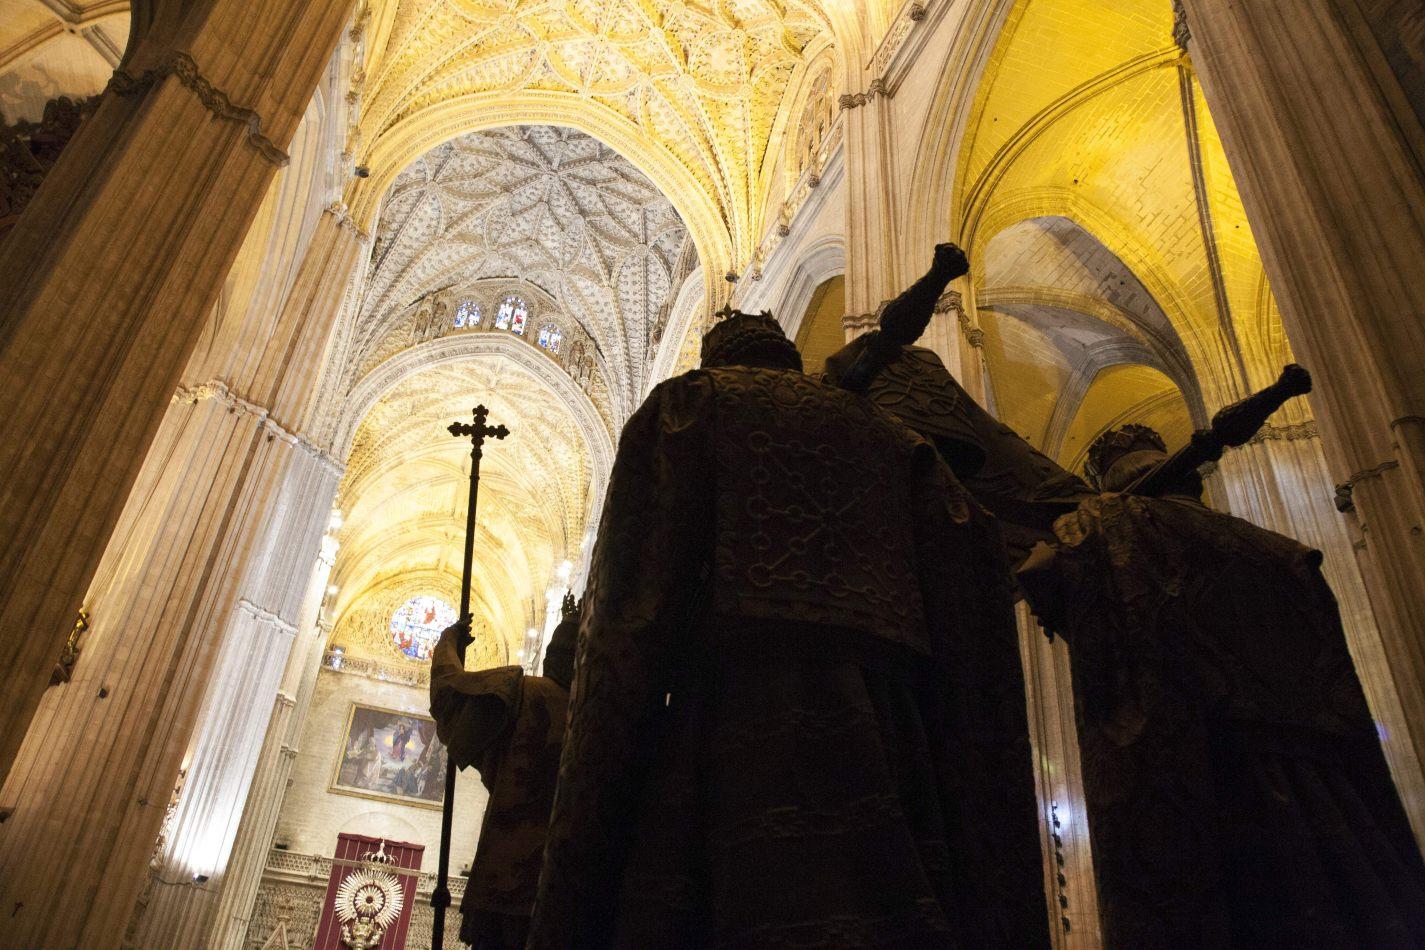 Anthony Ellis Photography: Around the Edges - Sevilla Claims Cristobal Colon